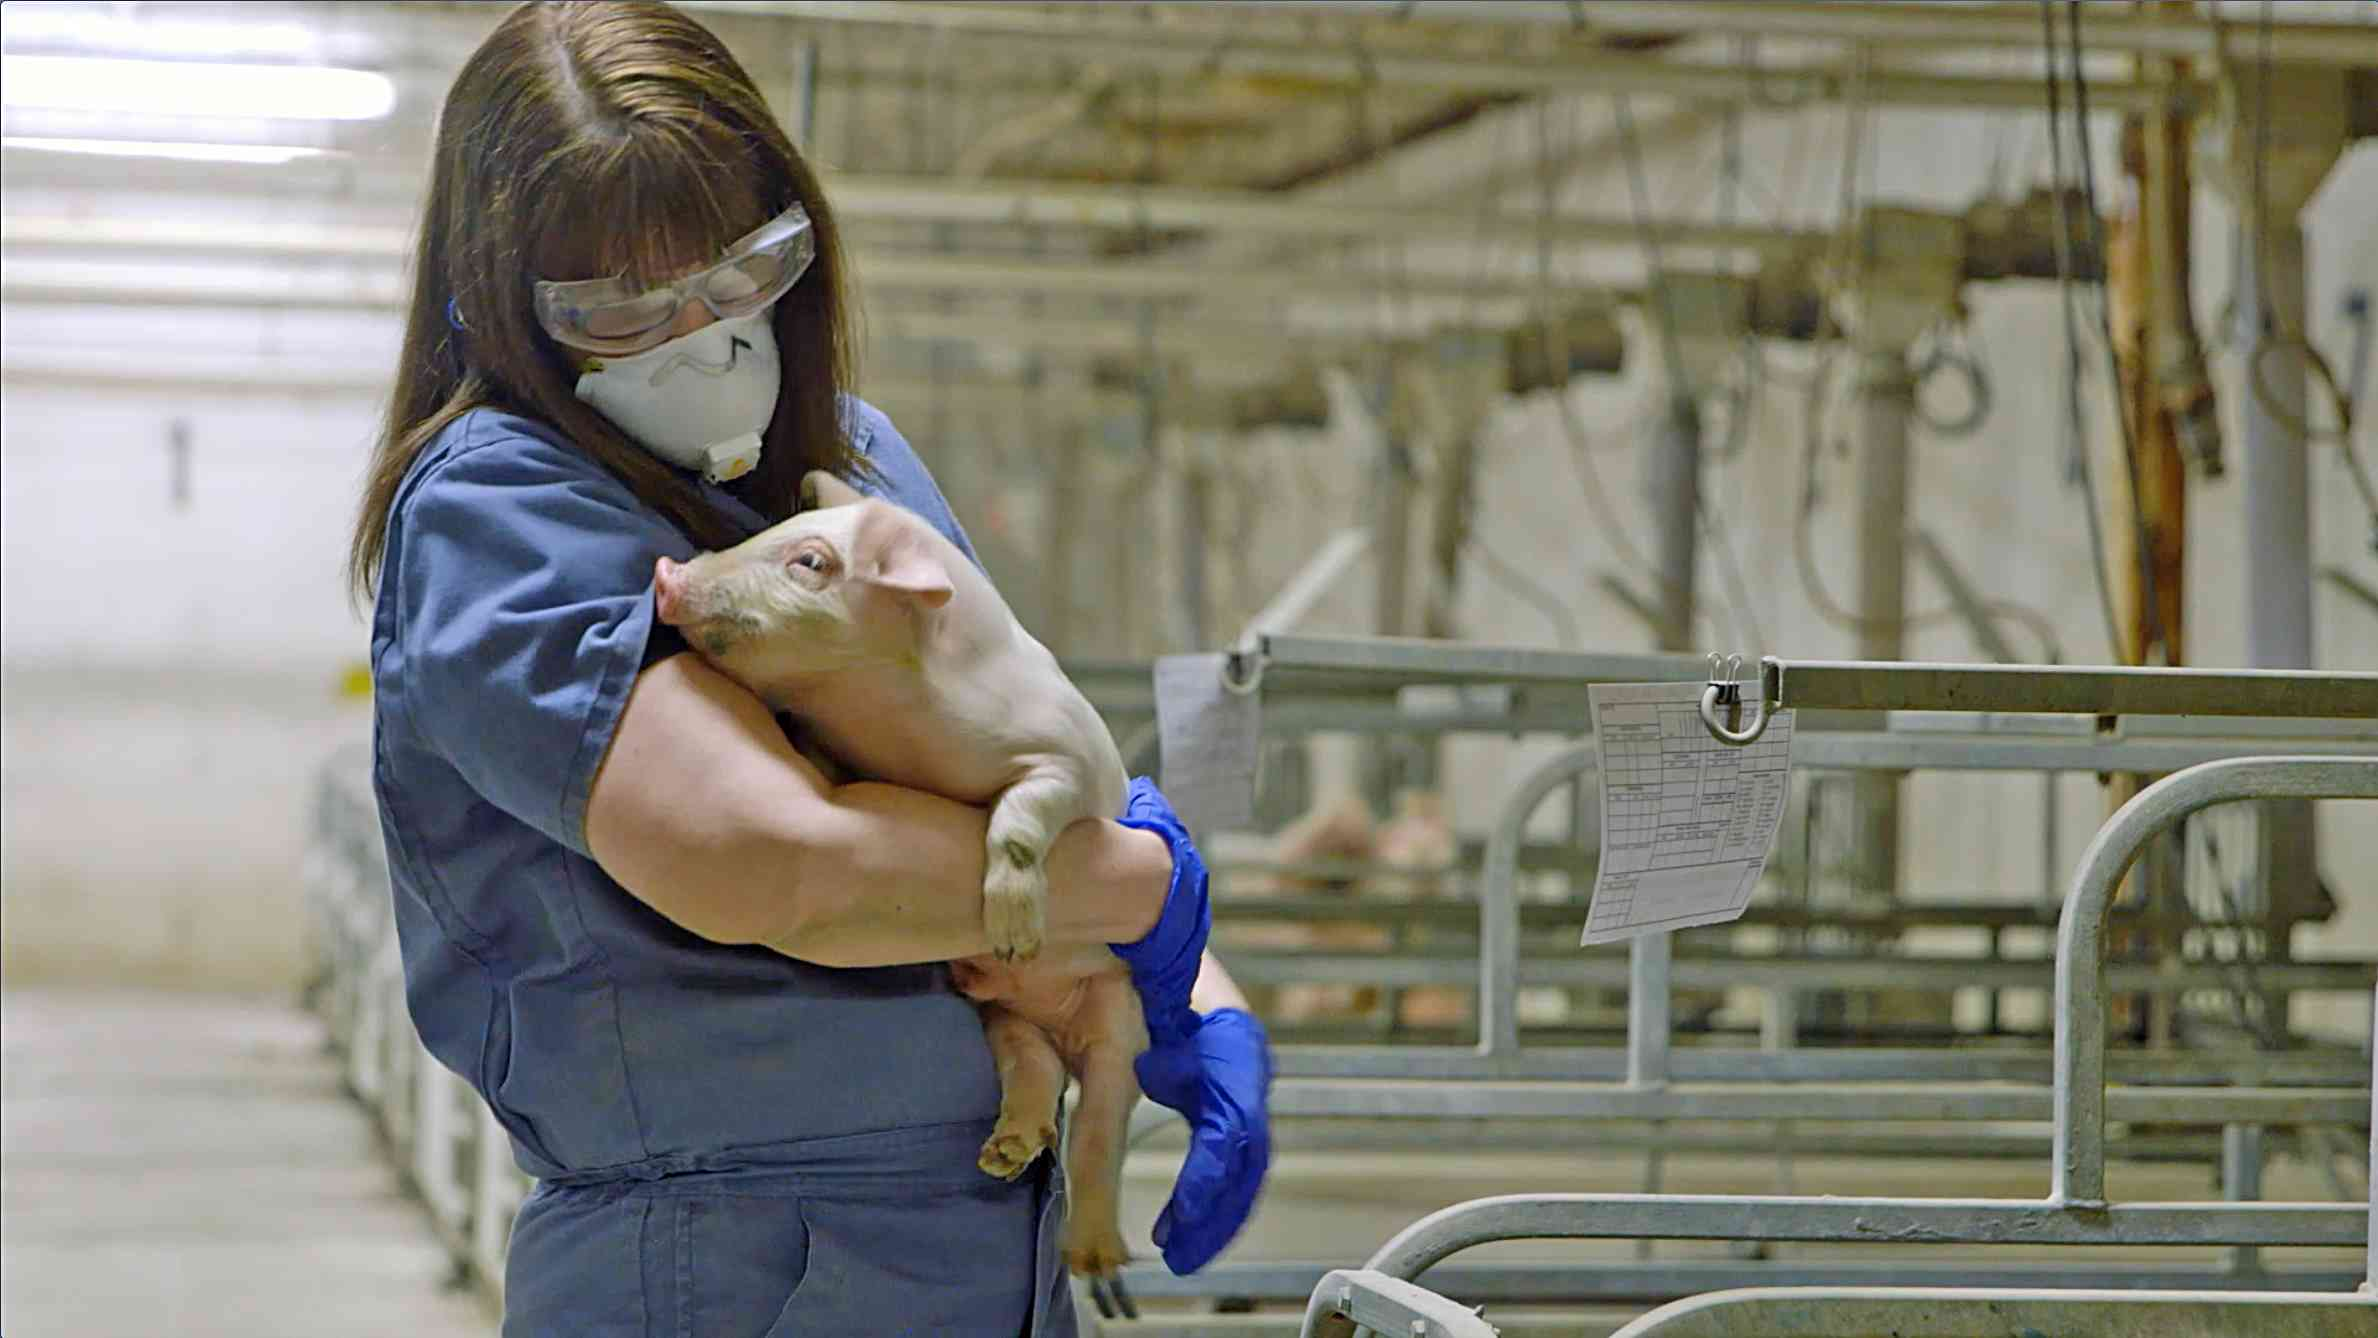 Employee holding Pig